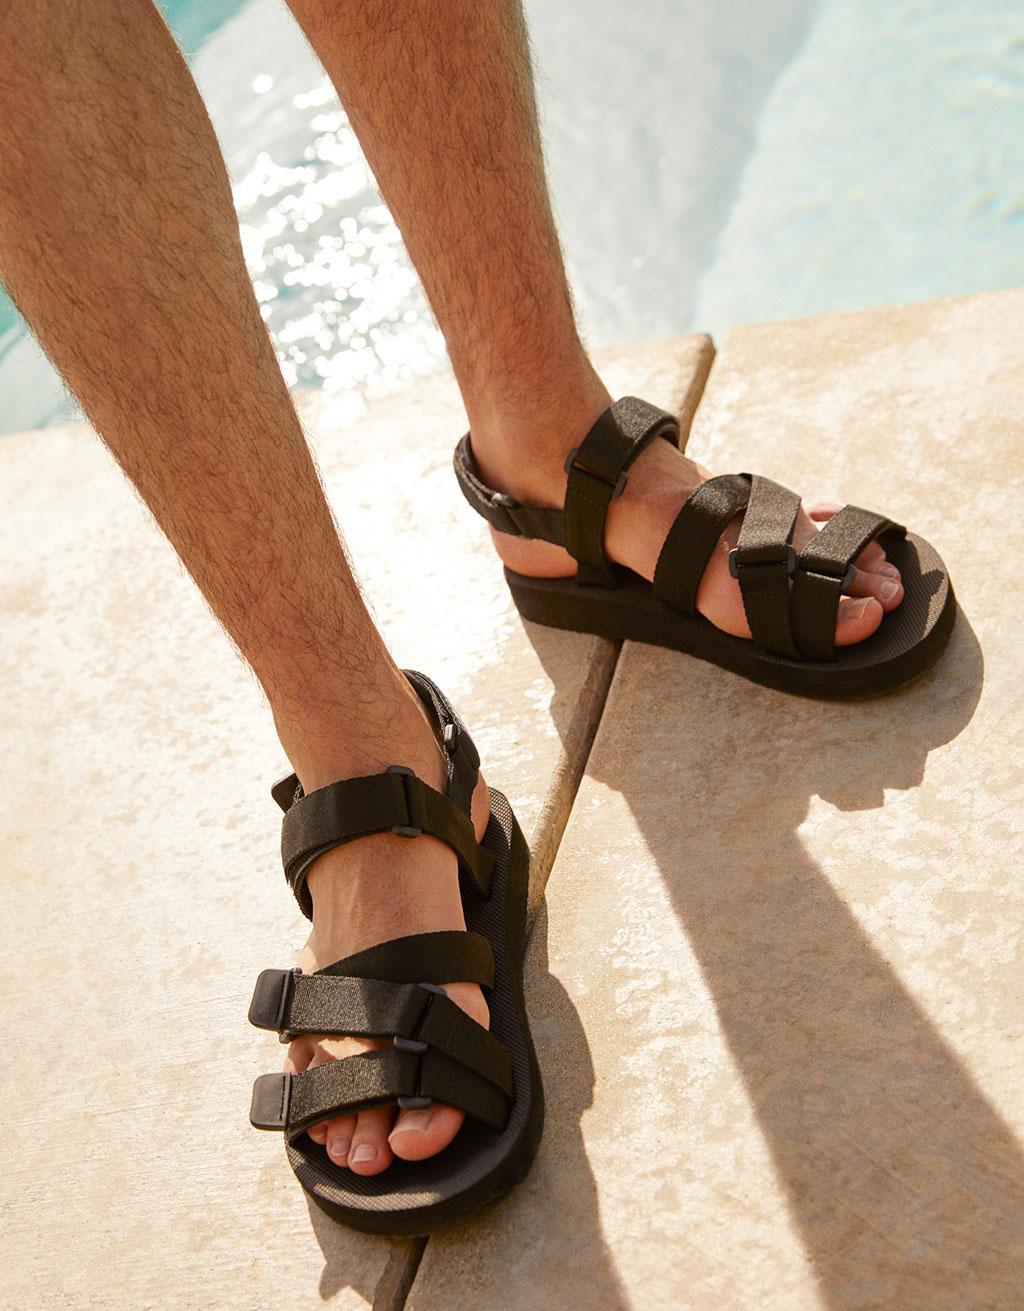 Sandalia deportiva negra tejido hombre